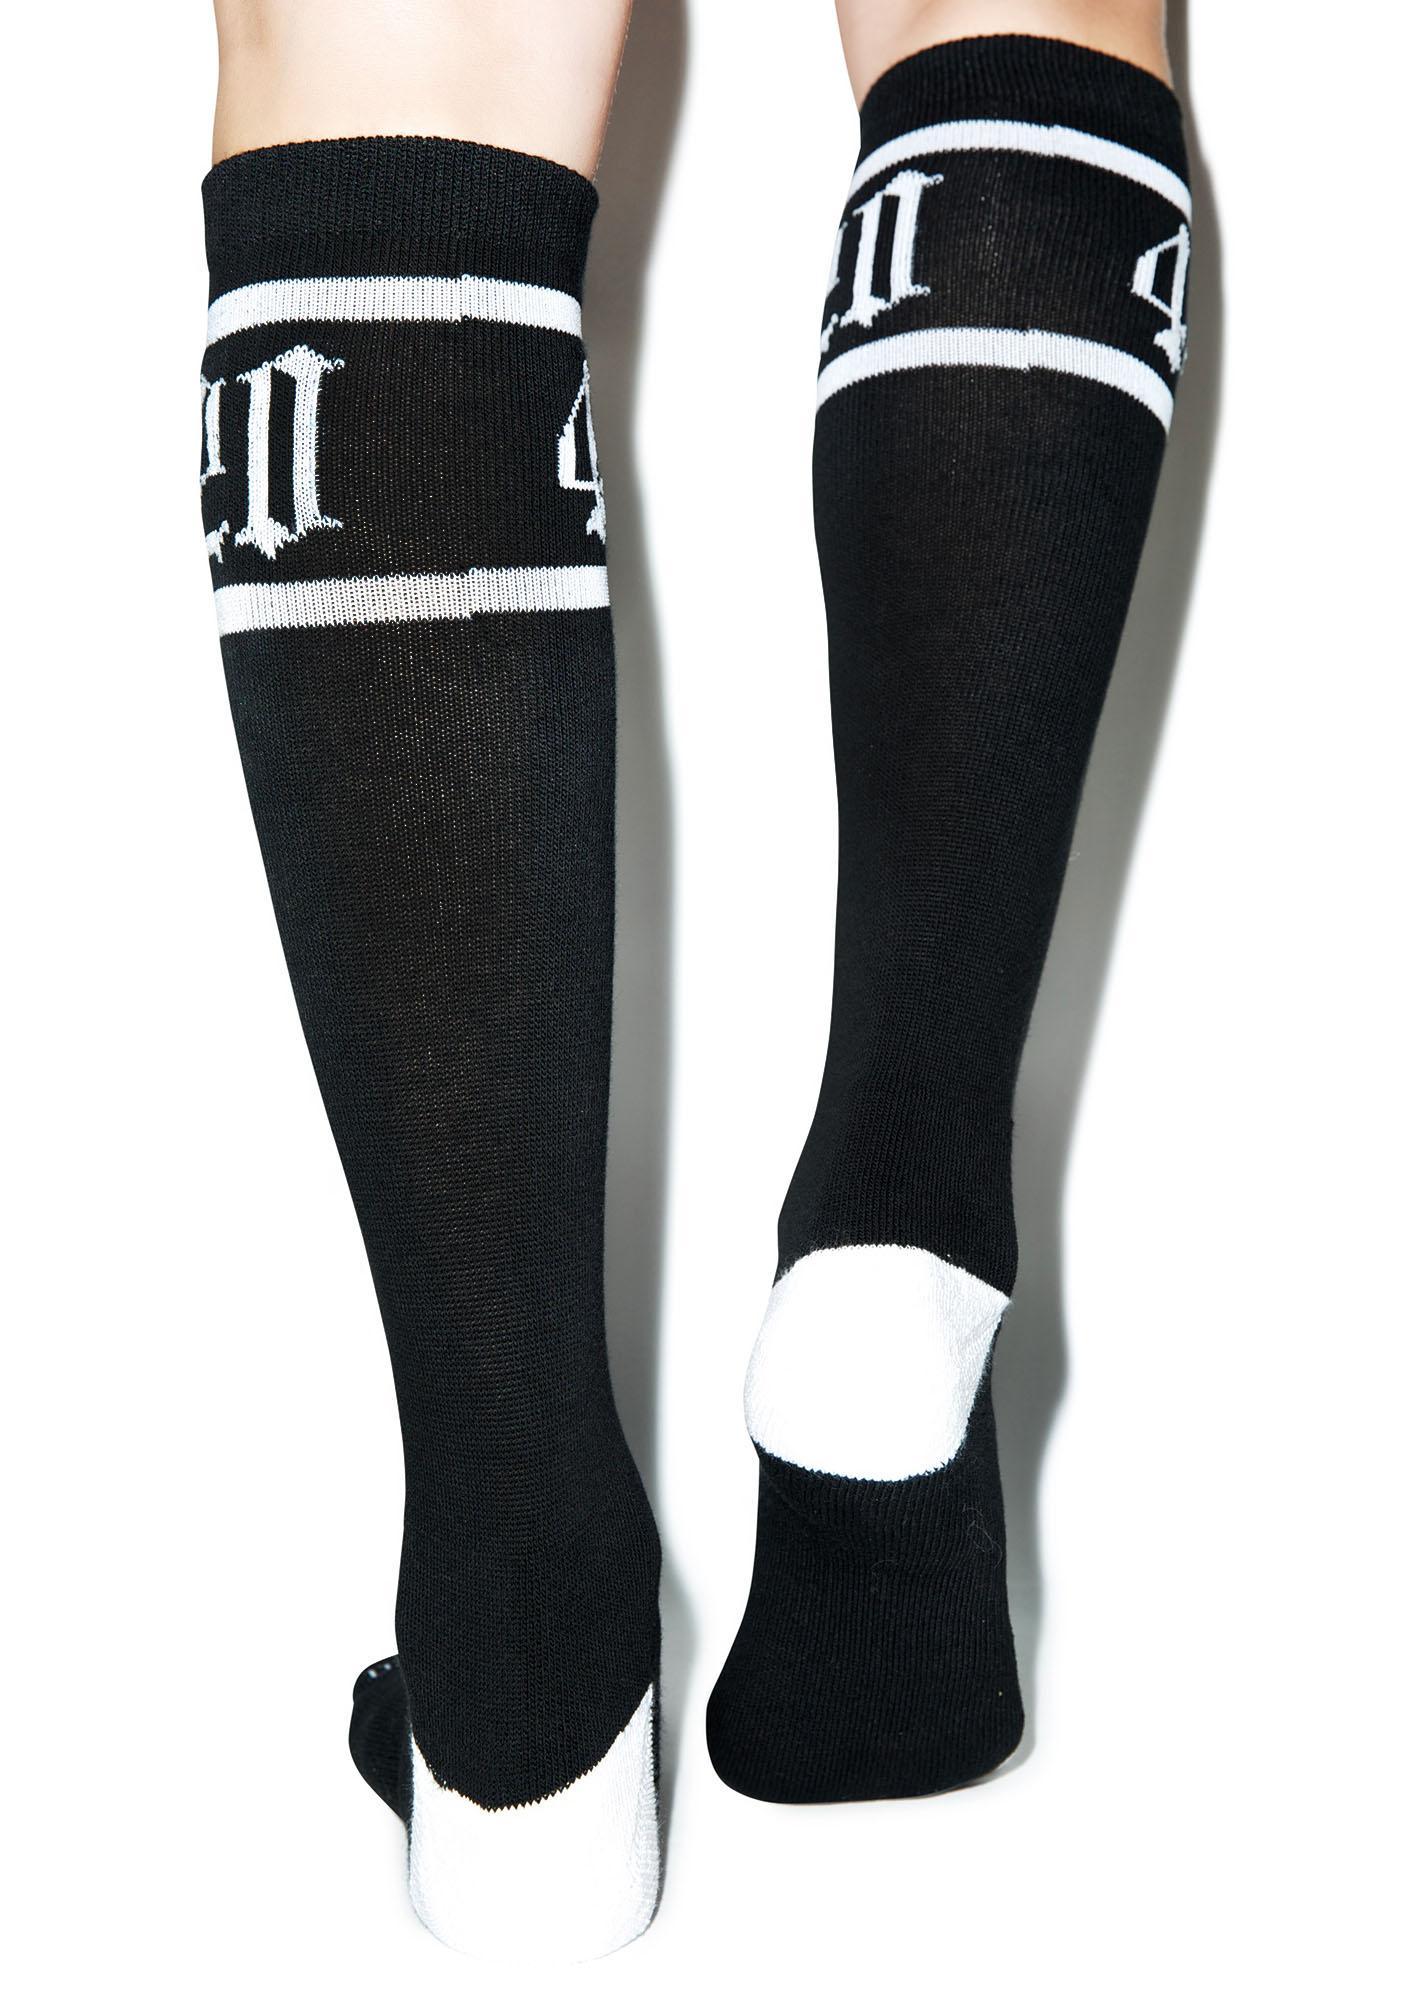 D9 Reserve 420 Socks